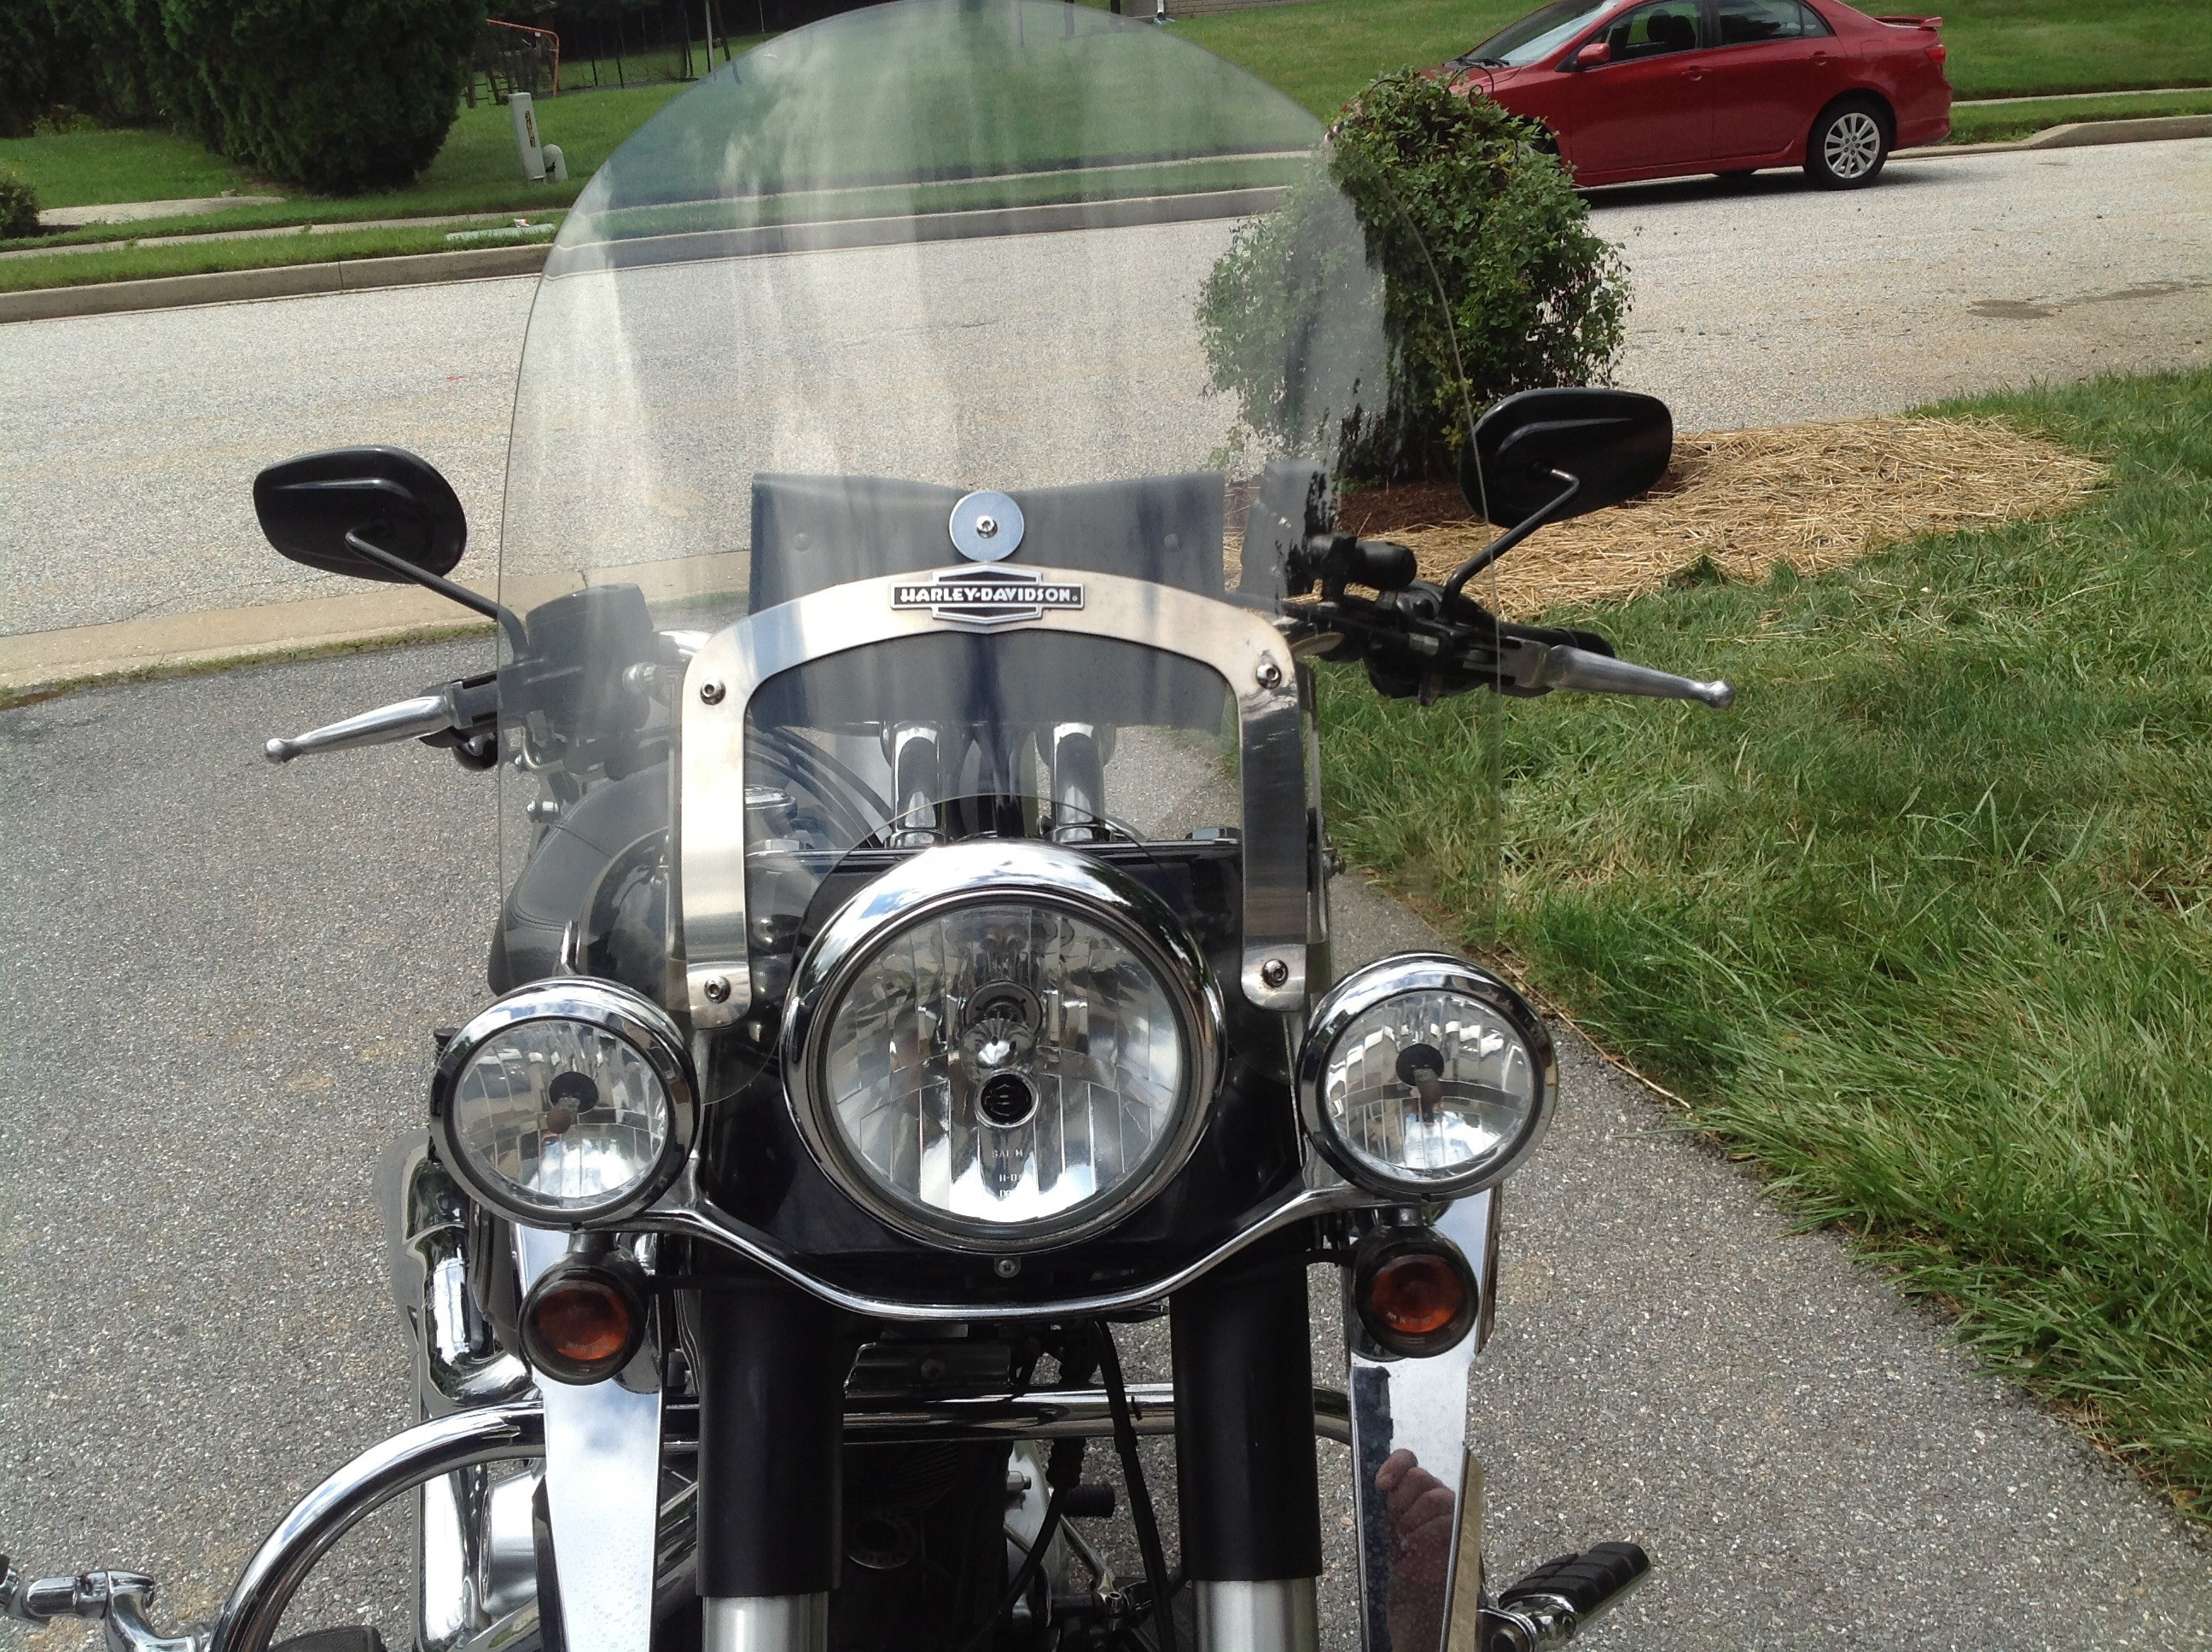 2011 Harley Davidson 174 Flstfb Softail 174 Fat Boy 174 Lo Vivid